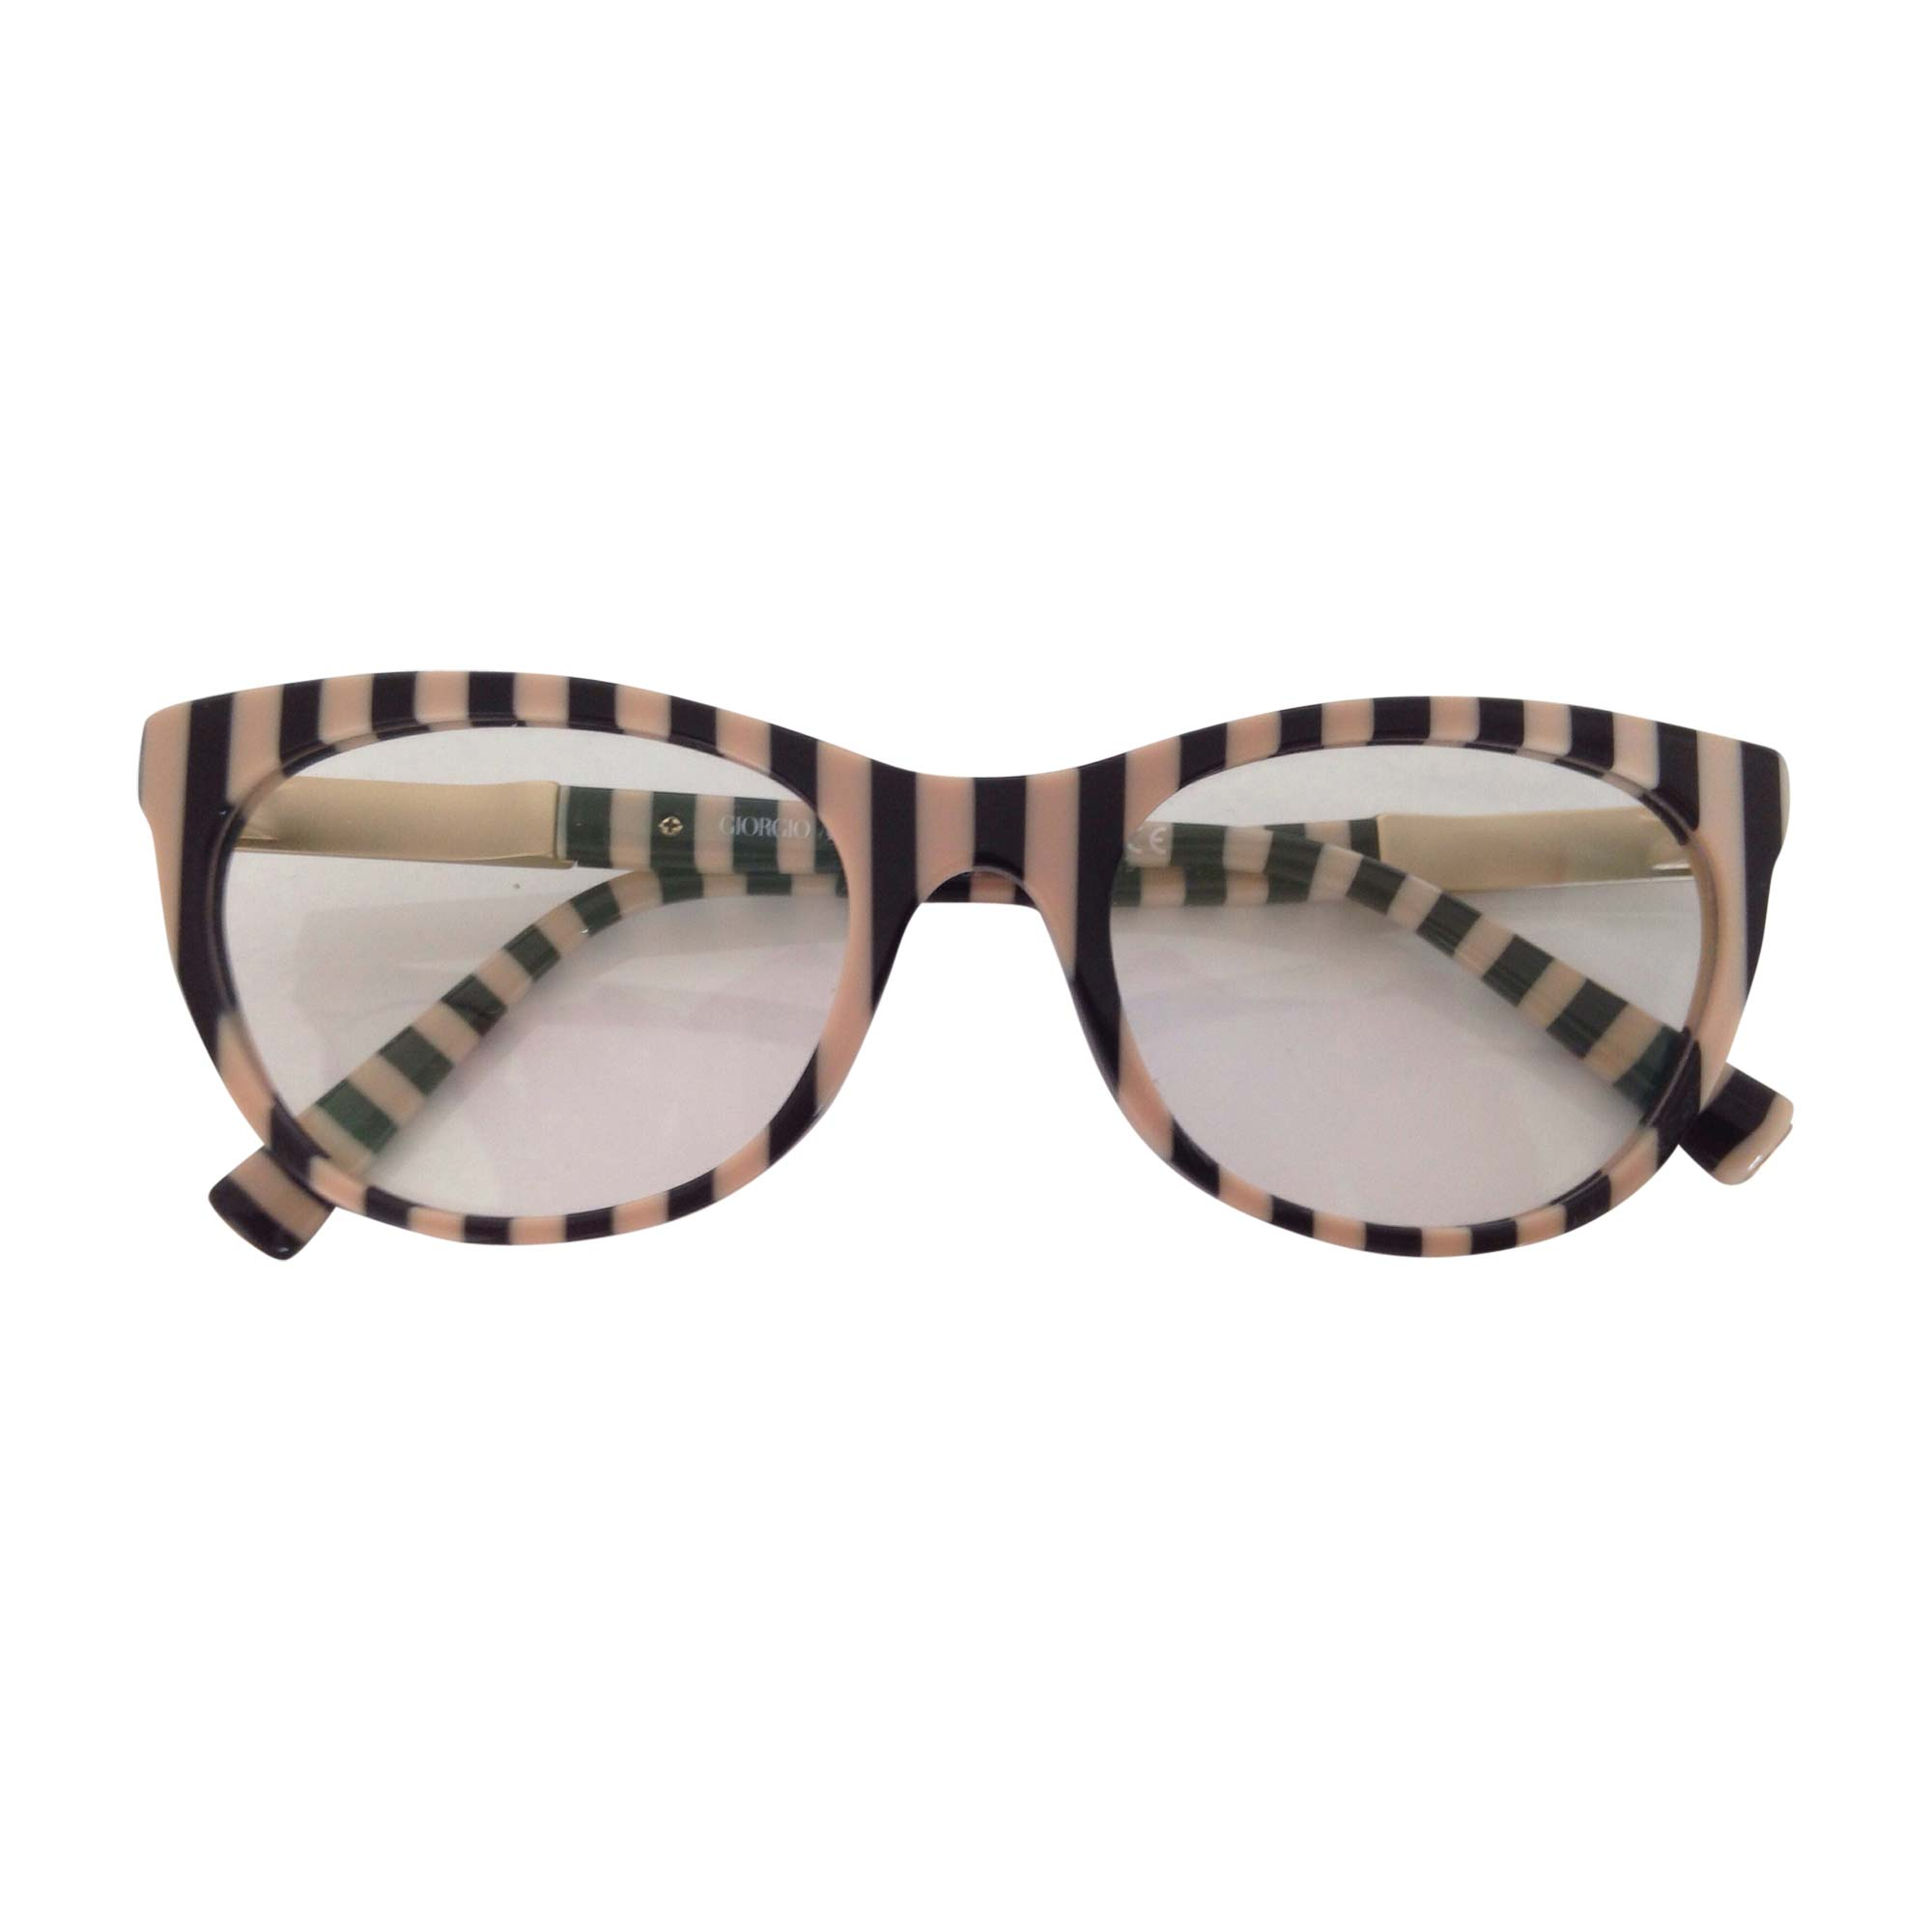 Eyeglass Frames GIORGIO ARMANI Beige, camel